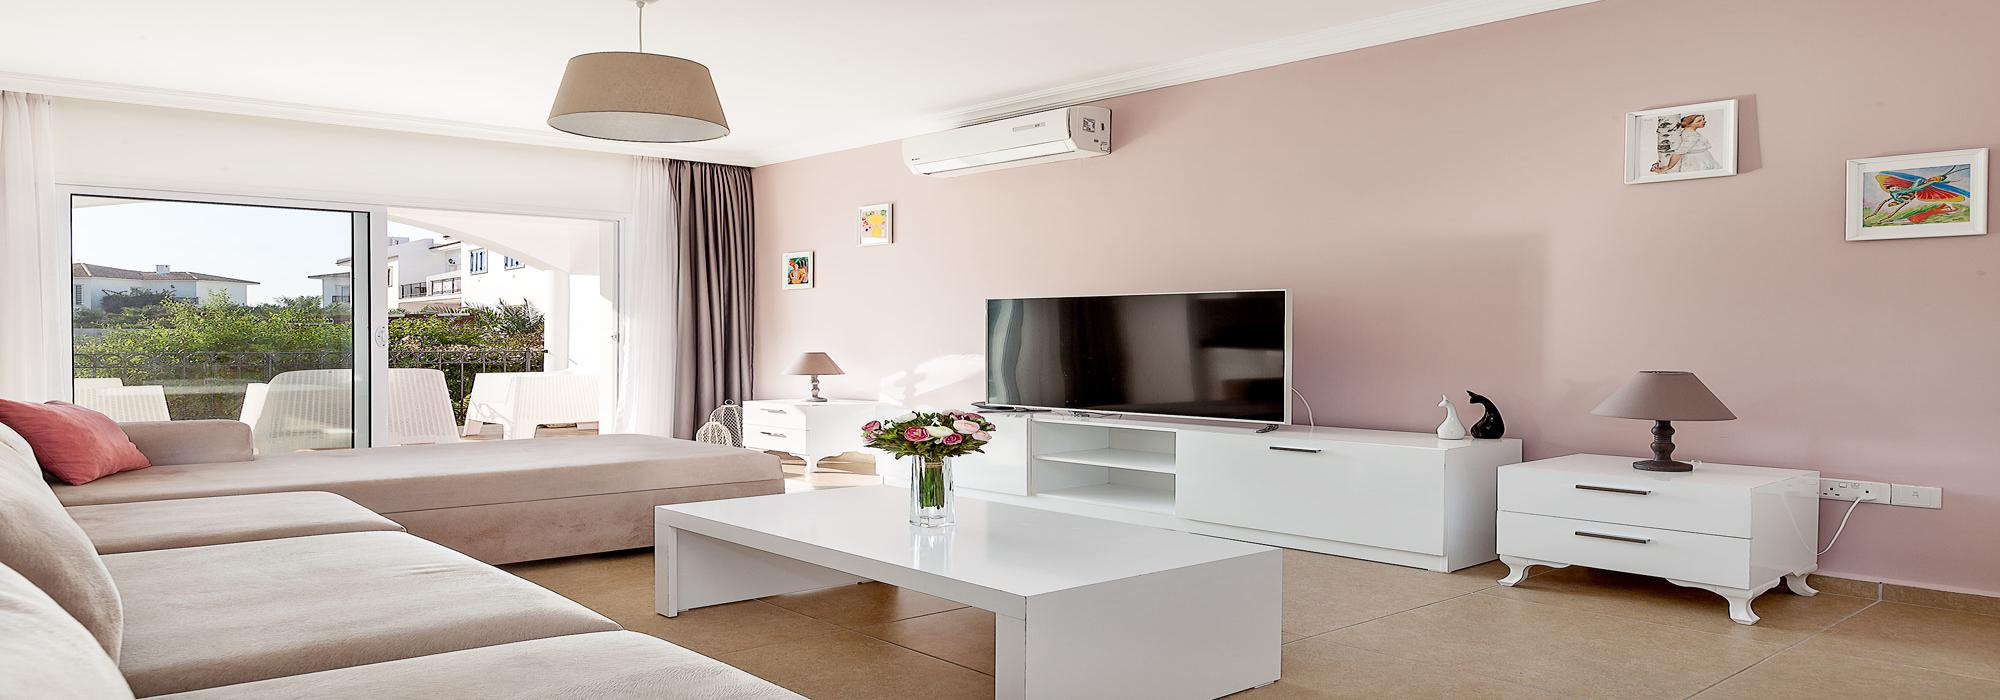 Elegant 3 Bedroom Apartment For Rent Location Esentepe Girne